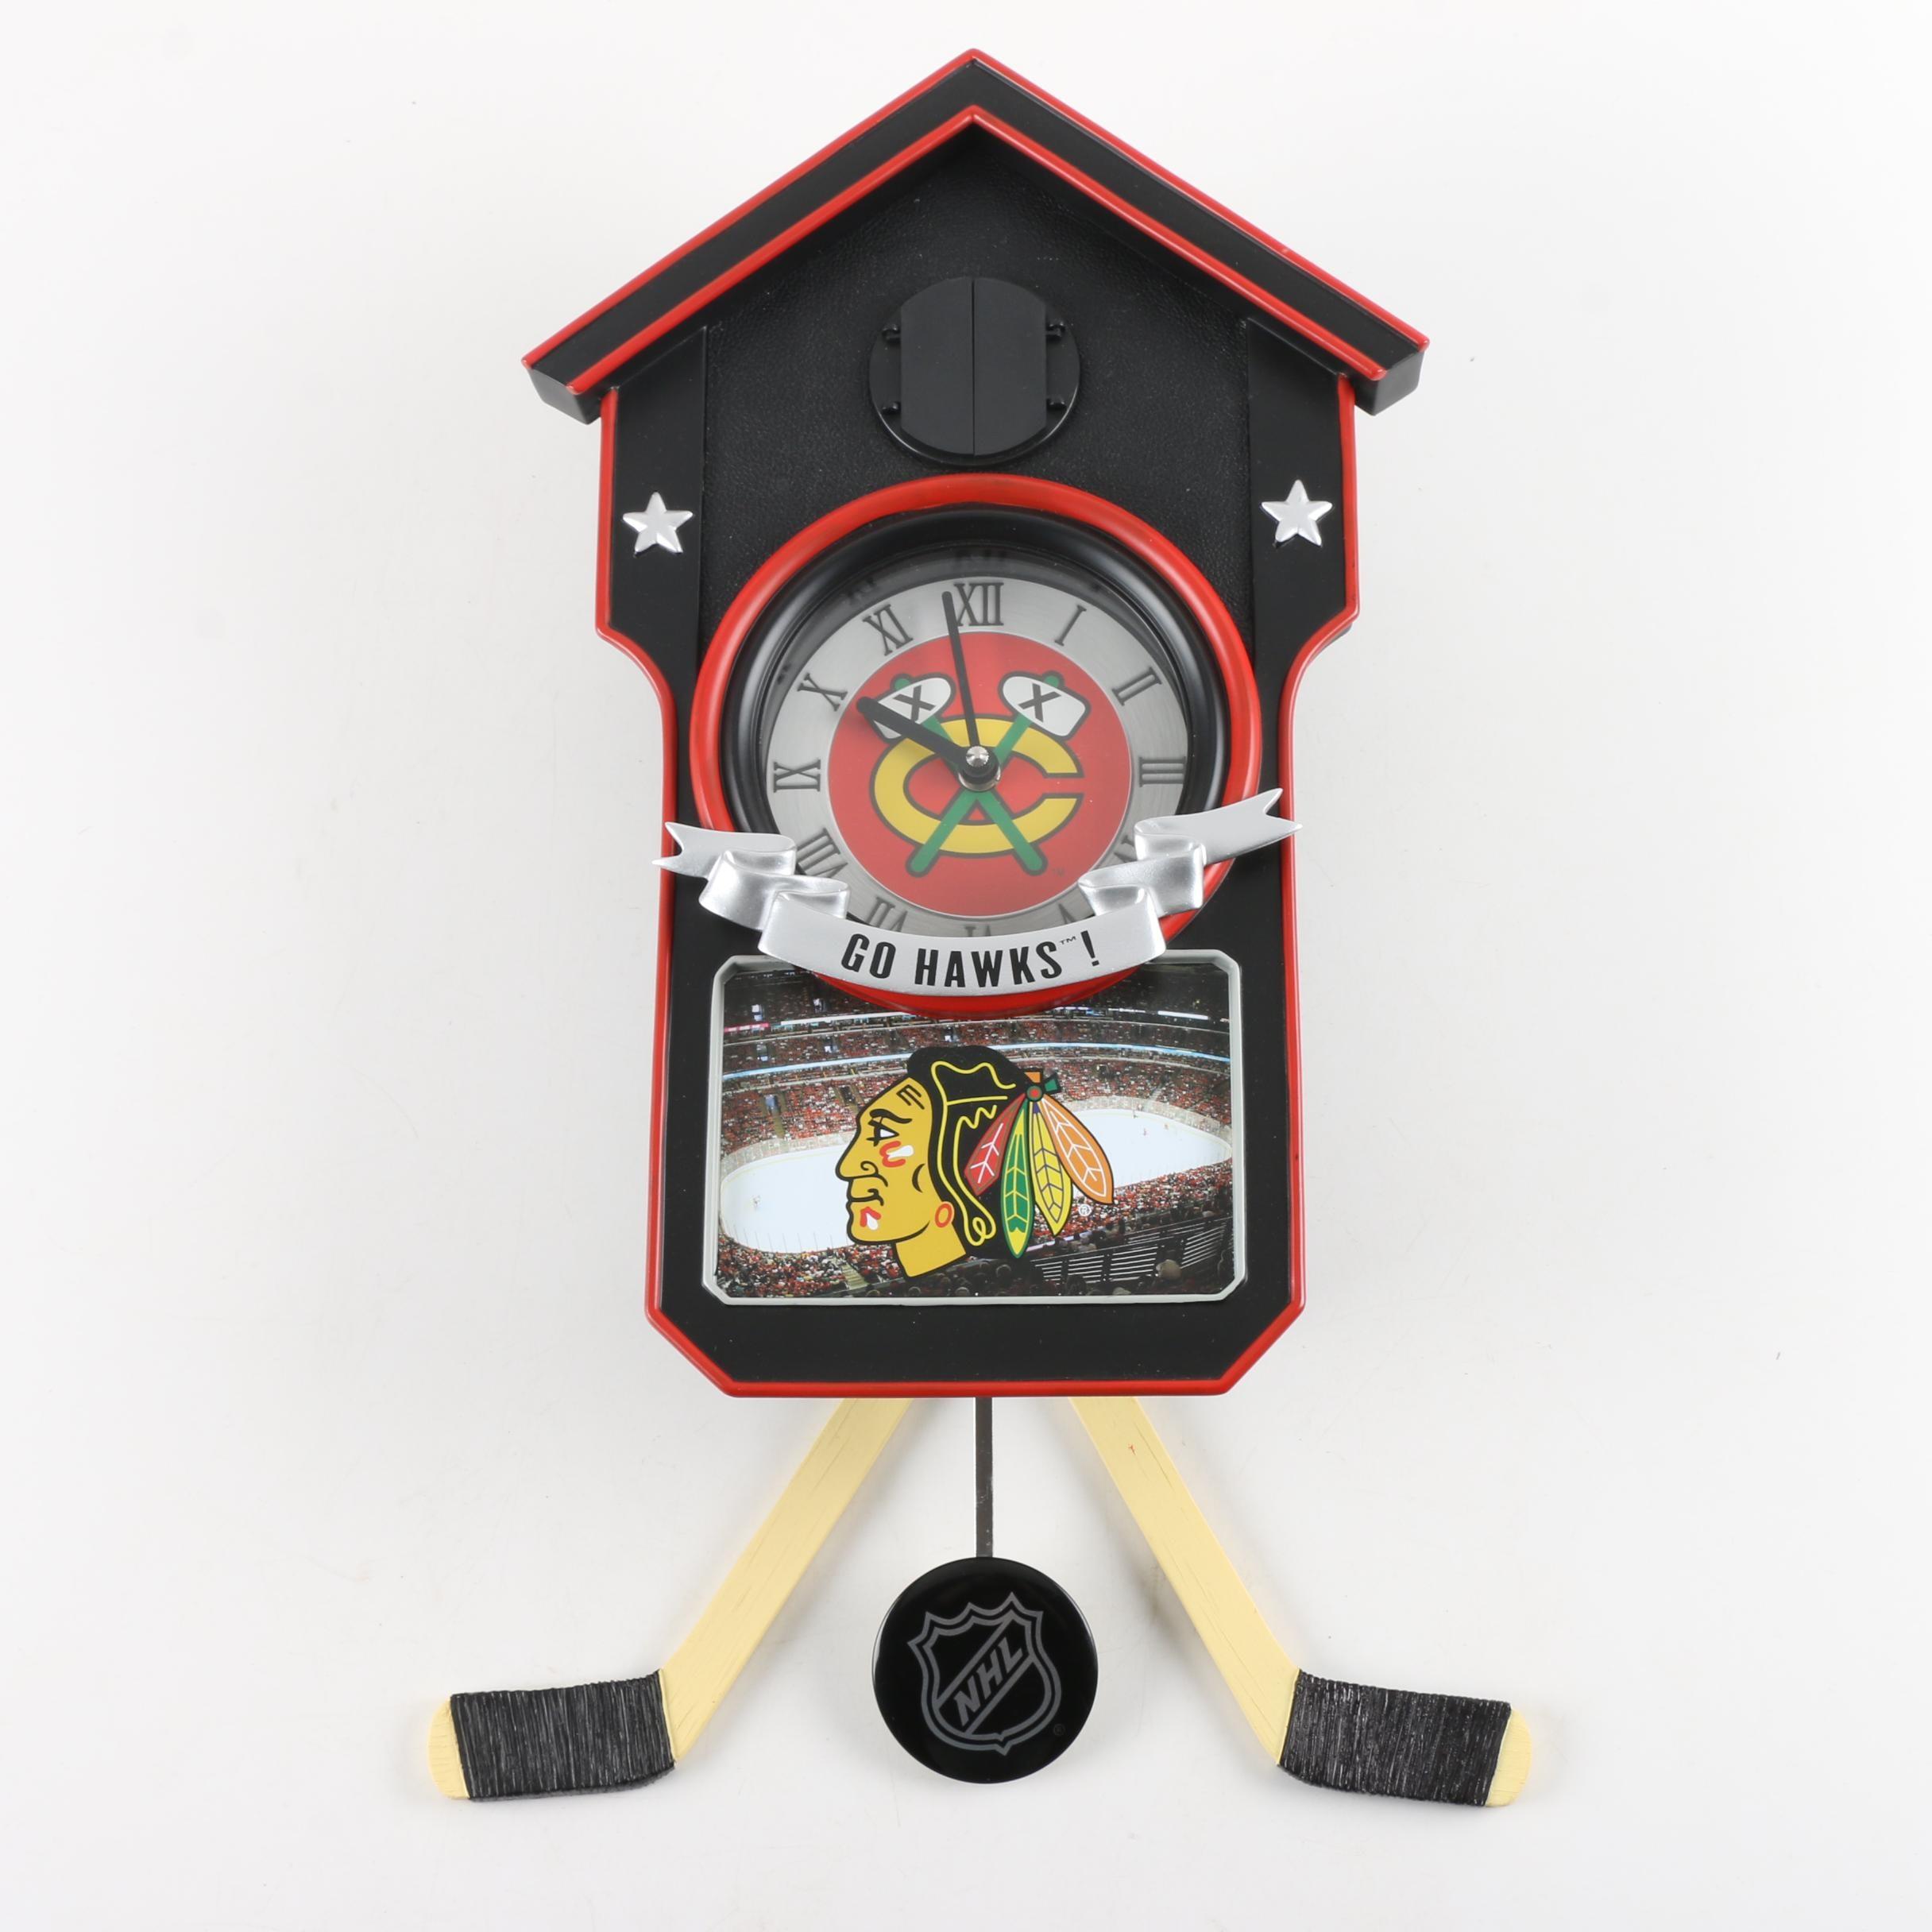 Limited Edition Chicago Blackhawks NHL Cuckoo Clock